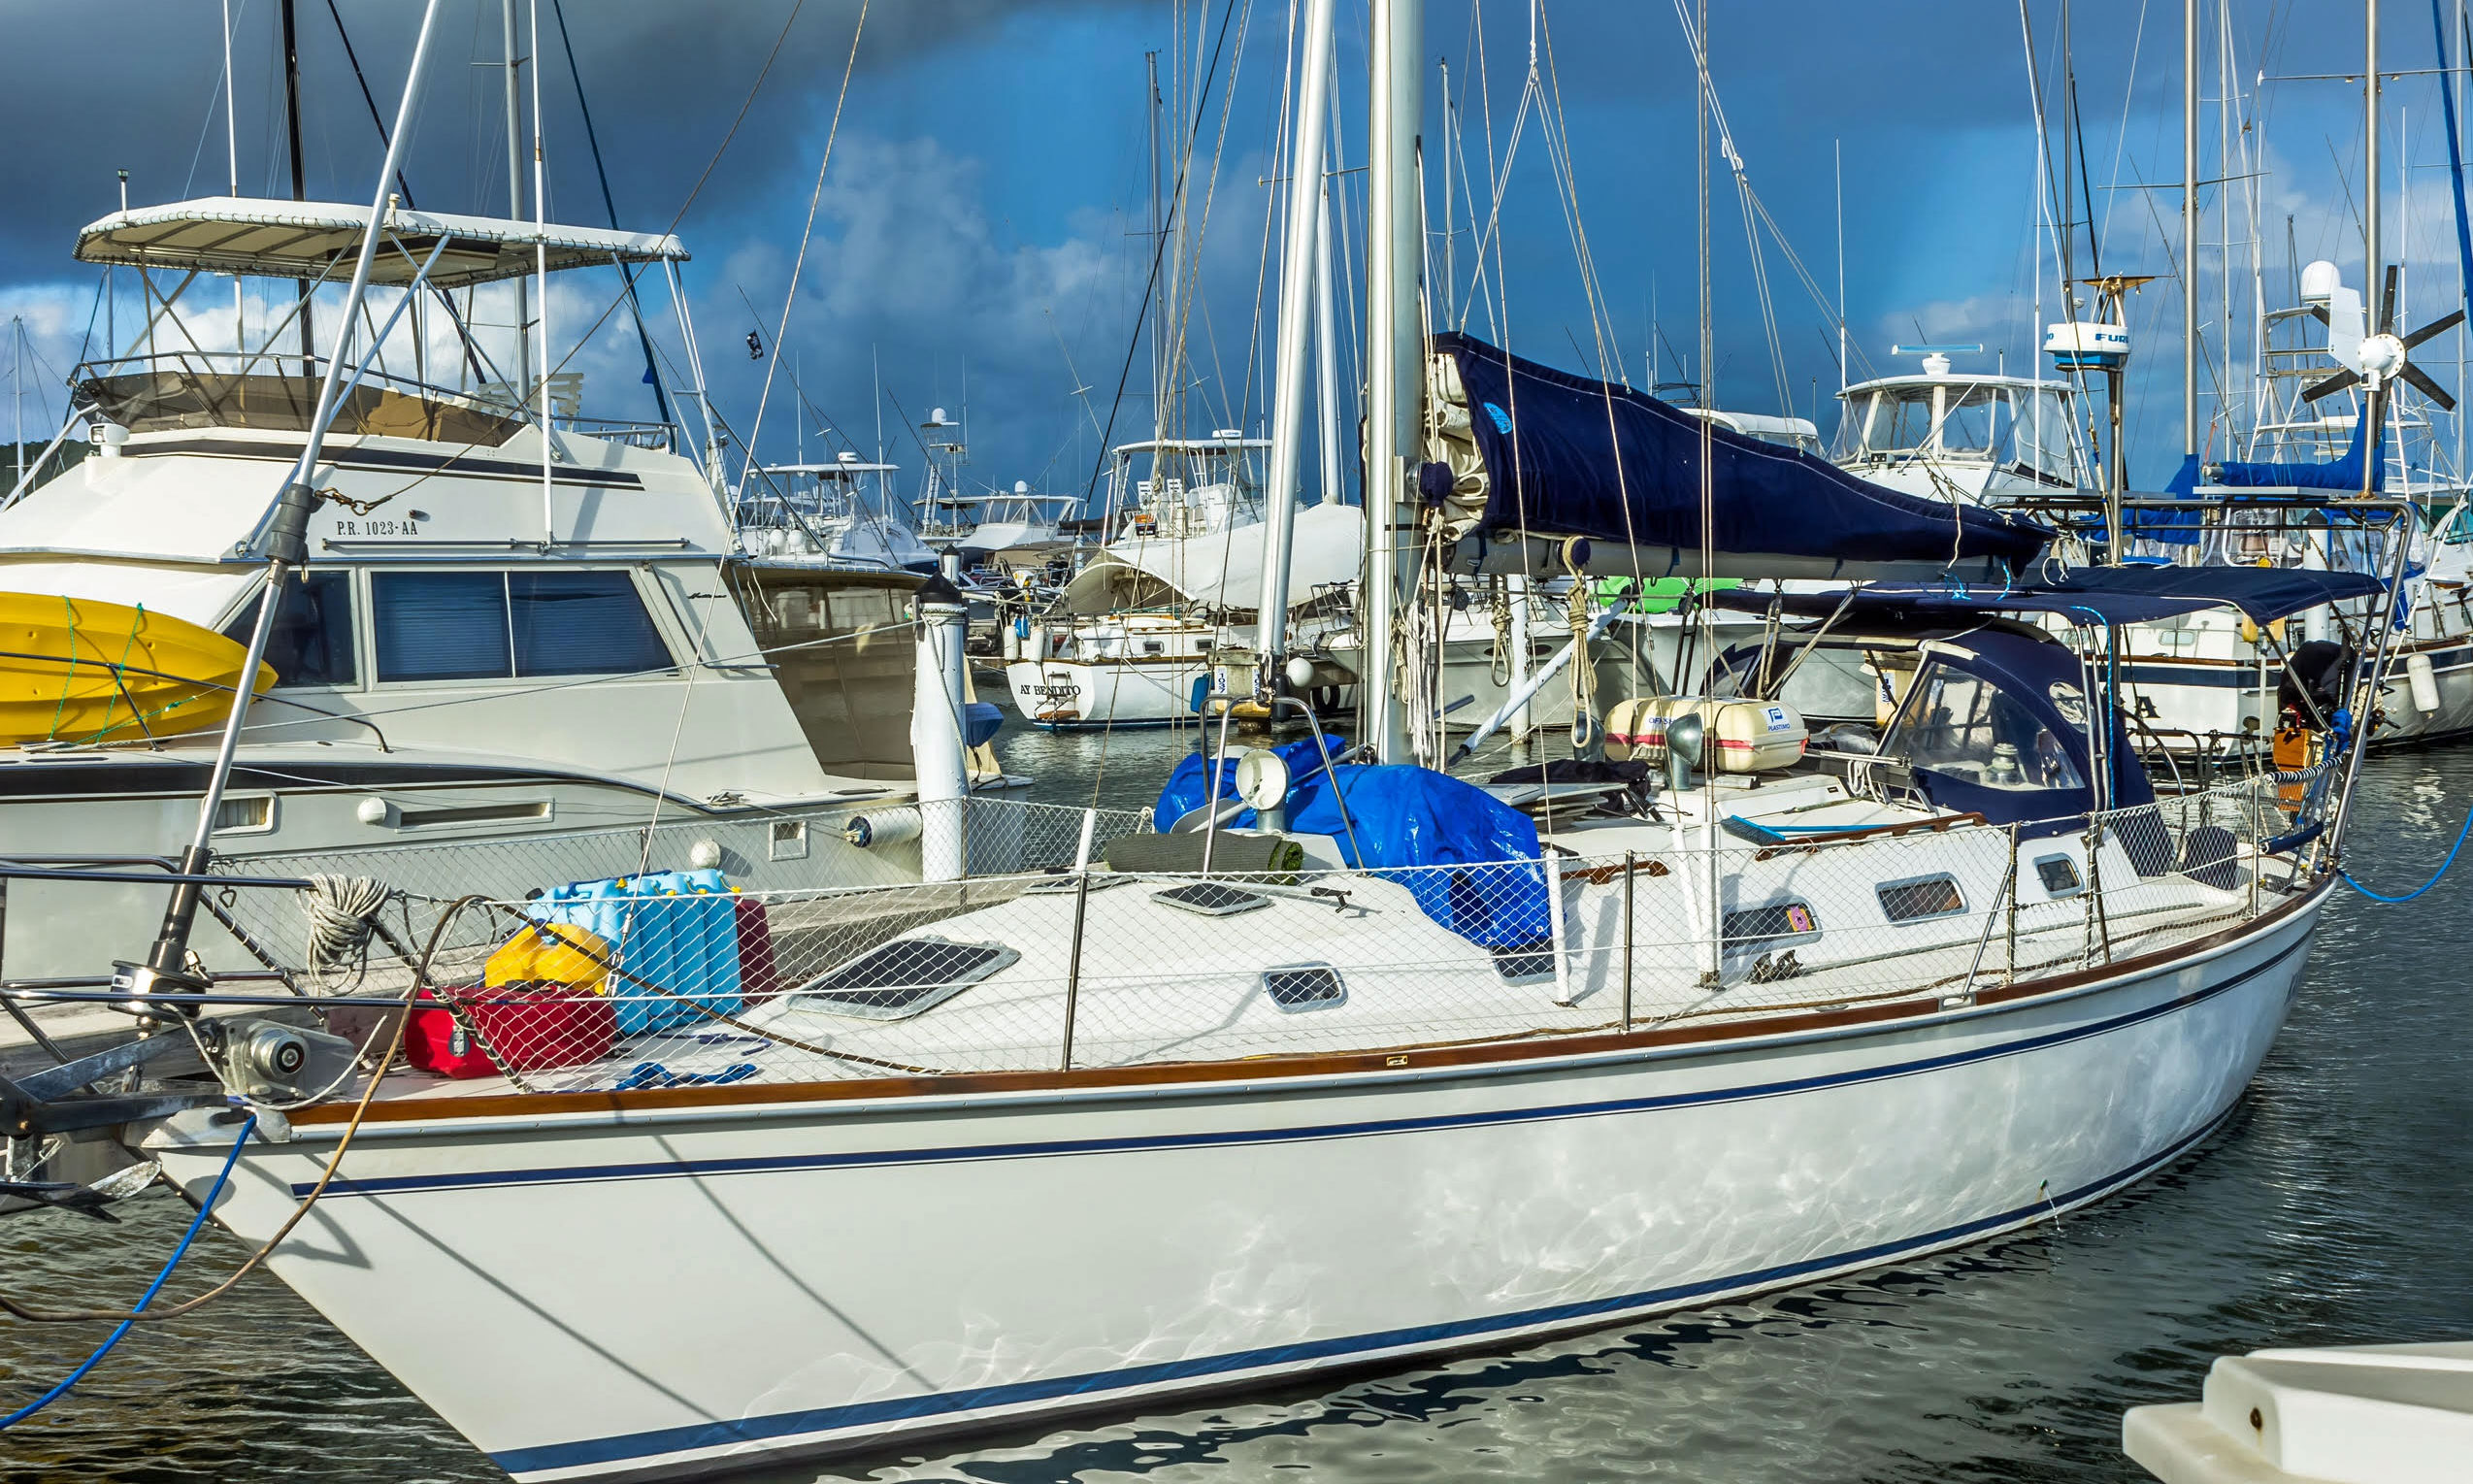 A Pearson 38 sailboat for sale